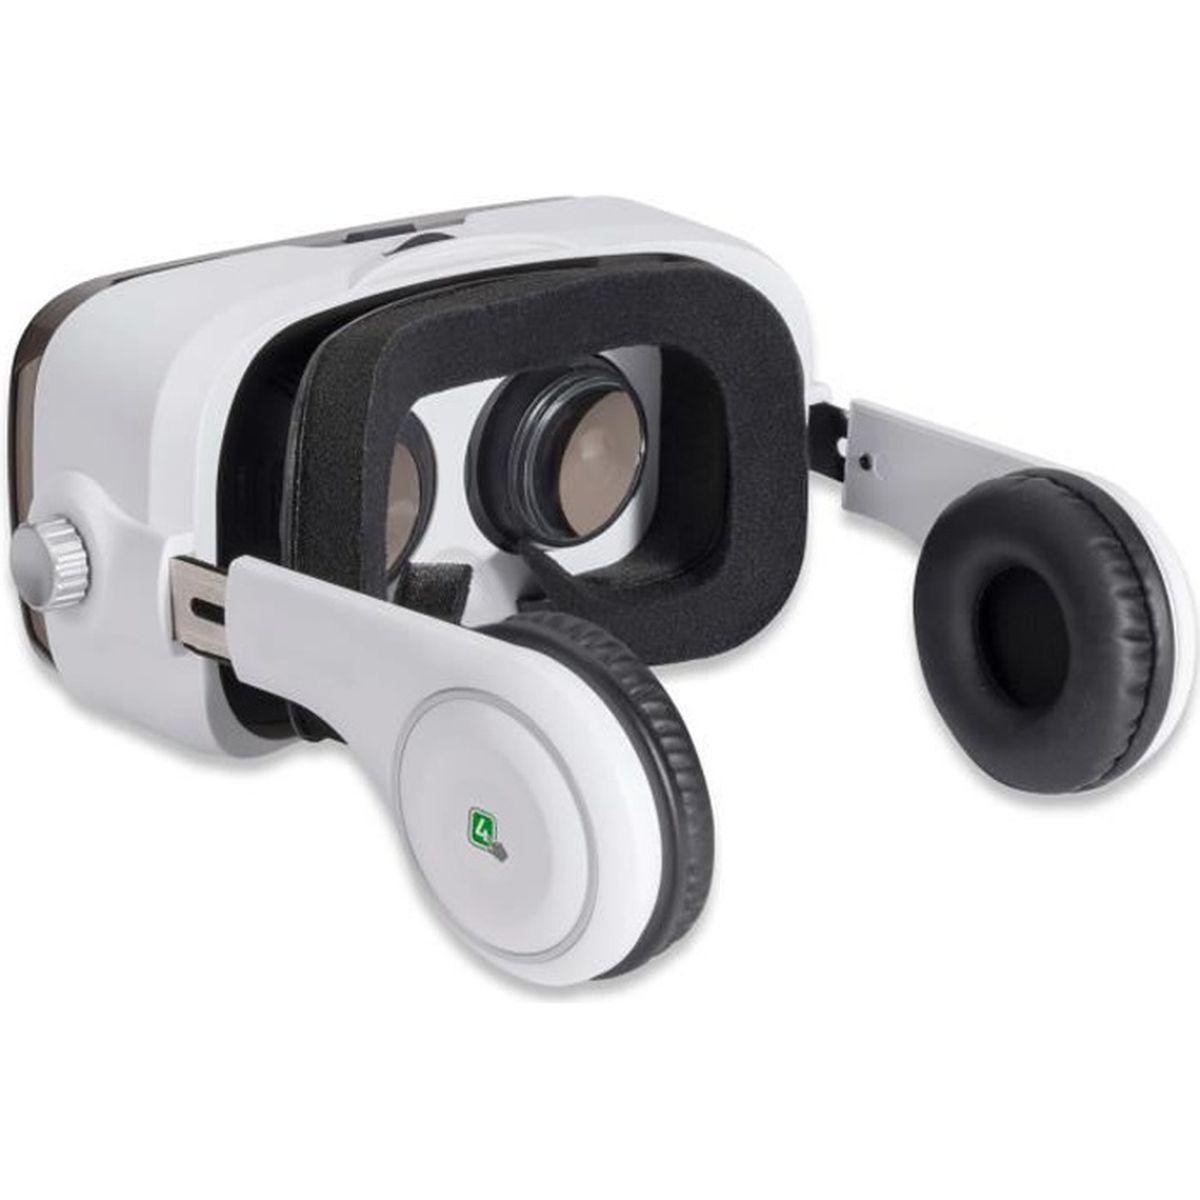 casque r alit virtuelle 3d spectator sound 4smarts achat vente casque r alit virtuelle. Black Bedroom Furniture Sets. Home Design Ideas